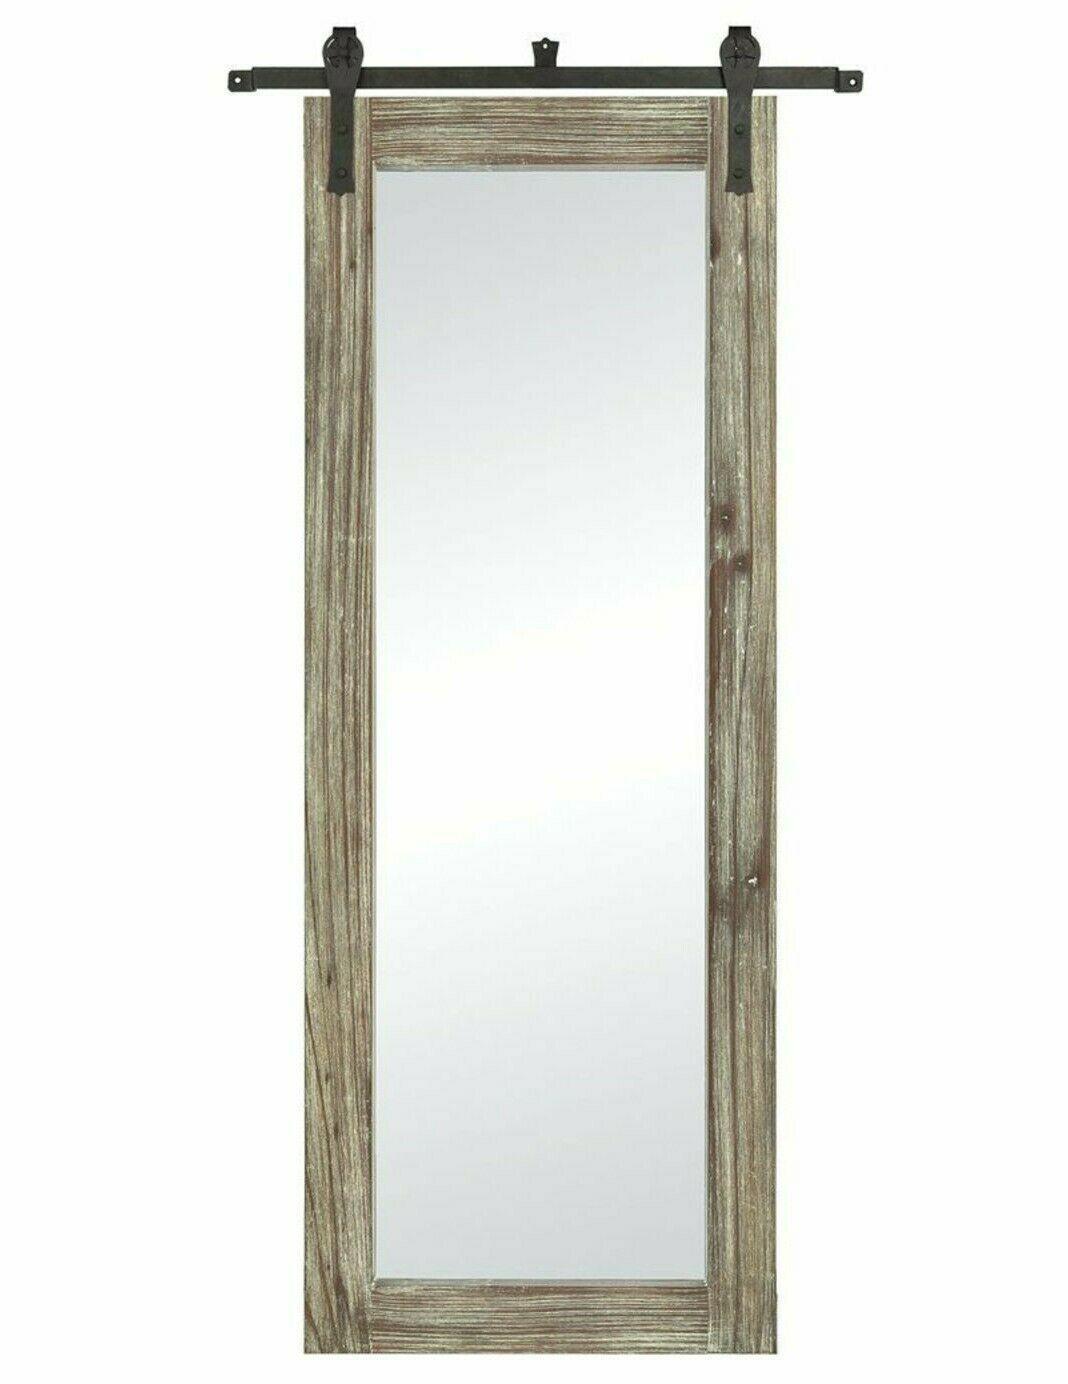 "Dressing Mirror Salvaged Wood Bronze Iron Hardware Modern Farmhouse Rustic 70"" - $311.84"